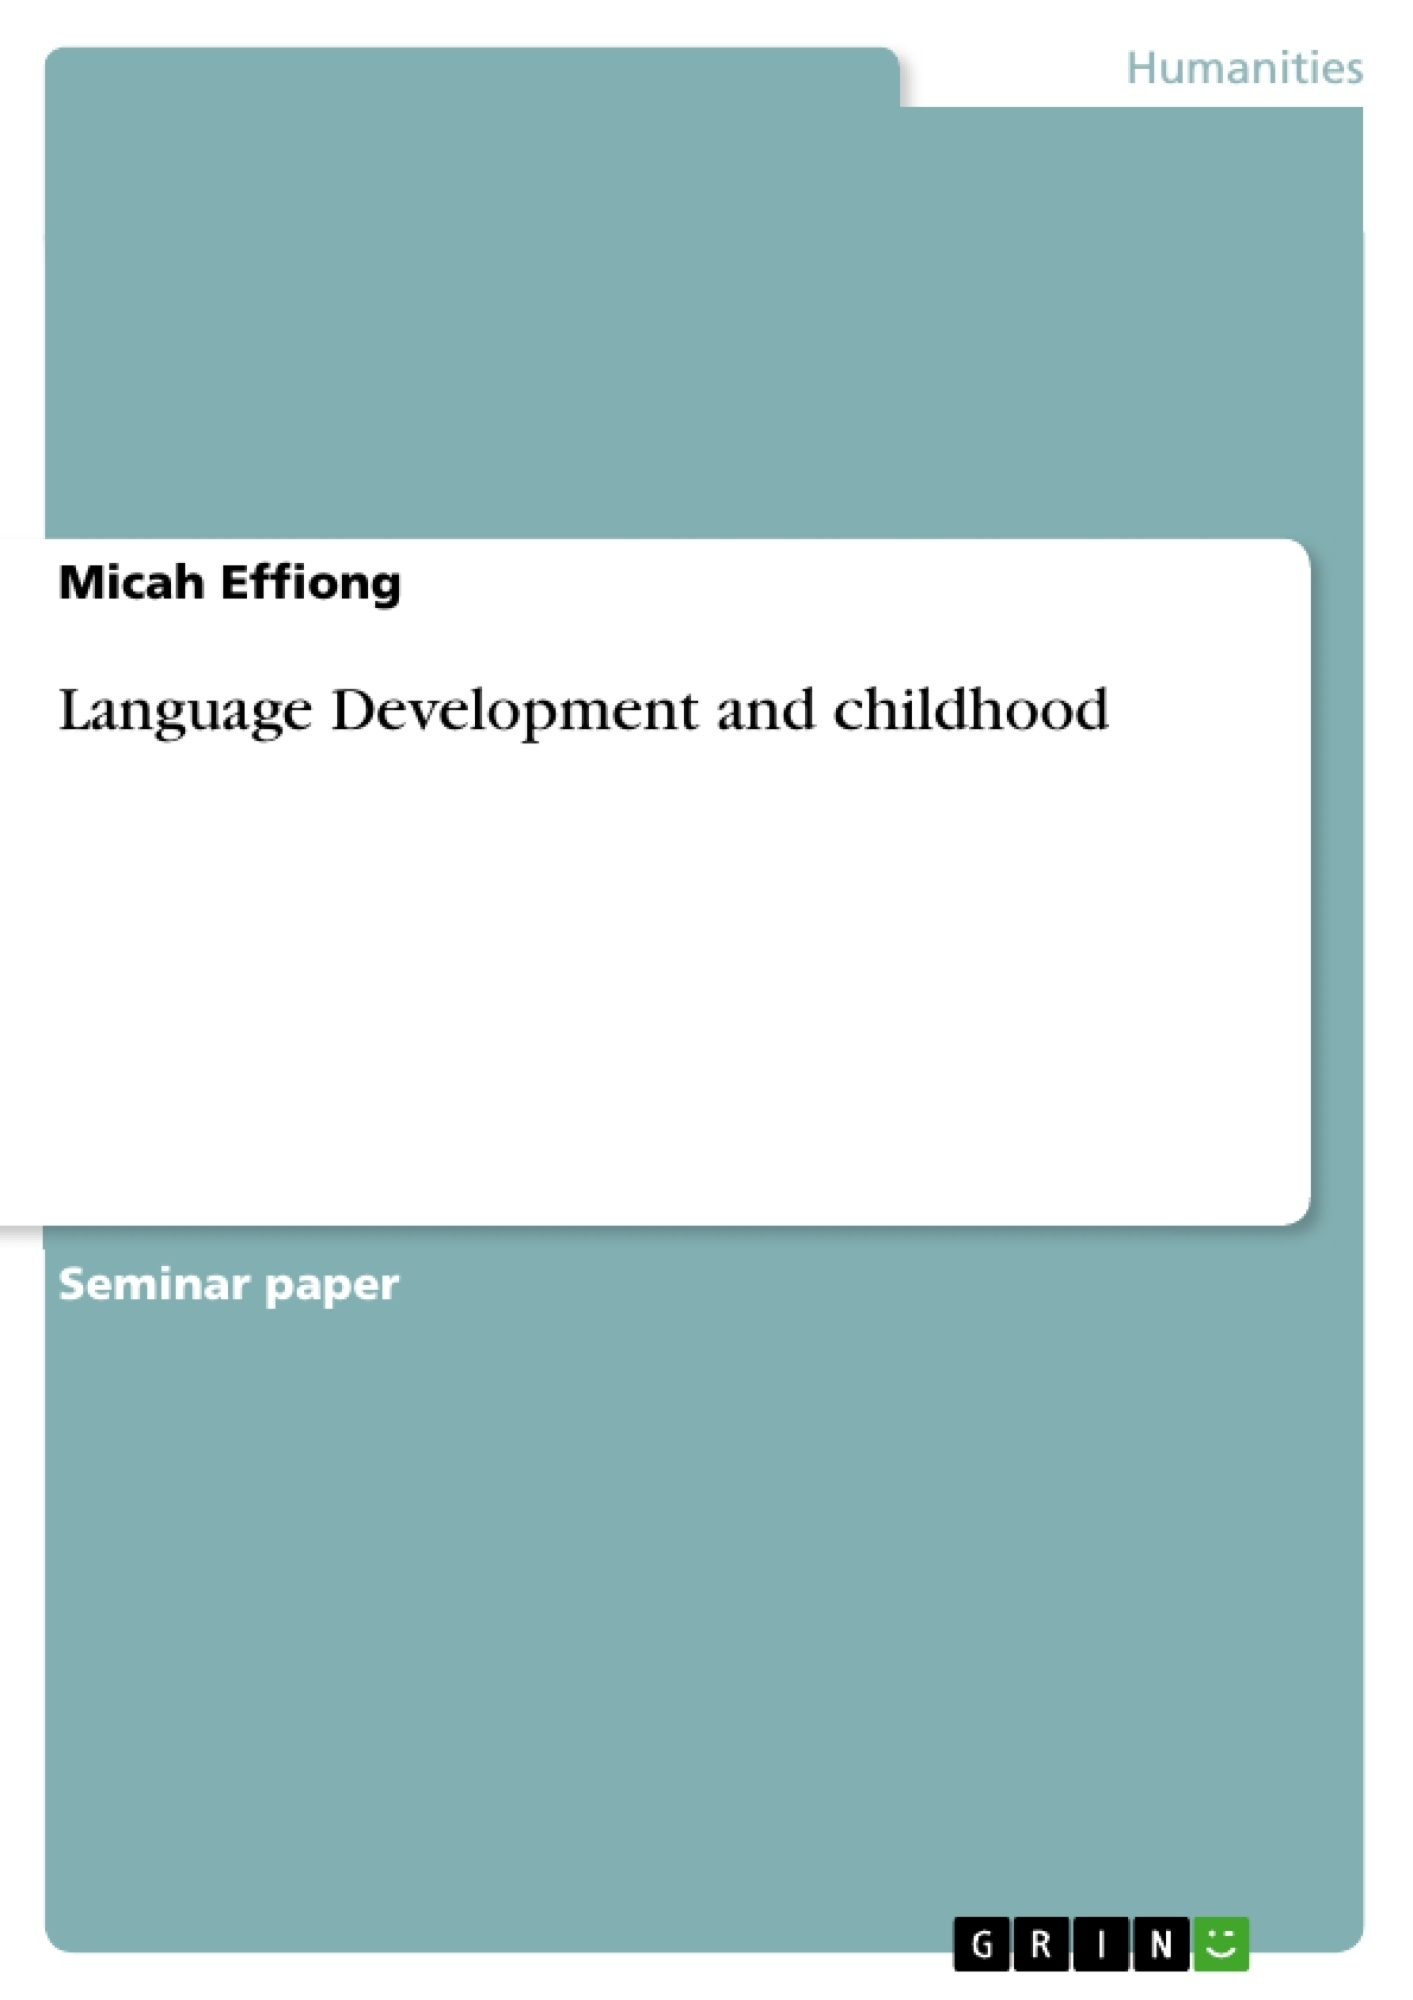 Title: Language Development and childhood